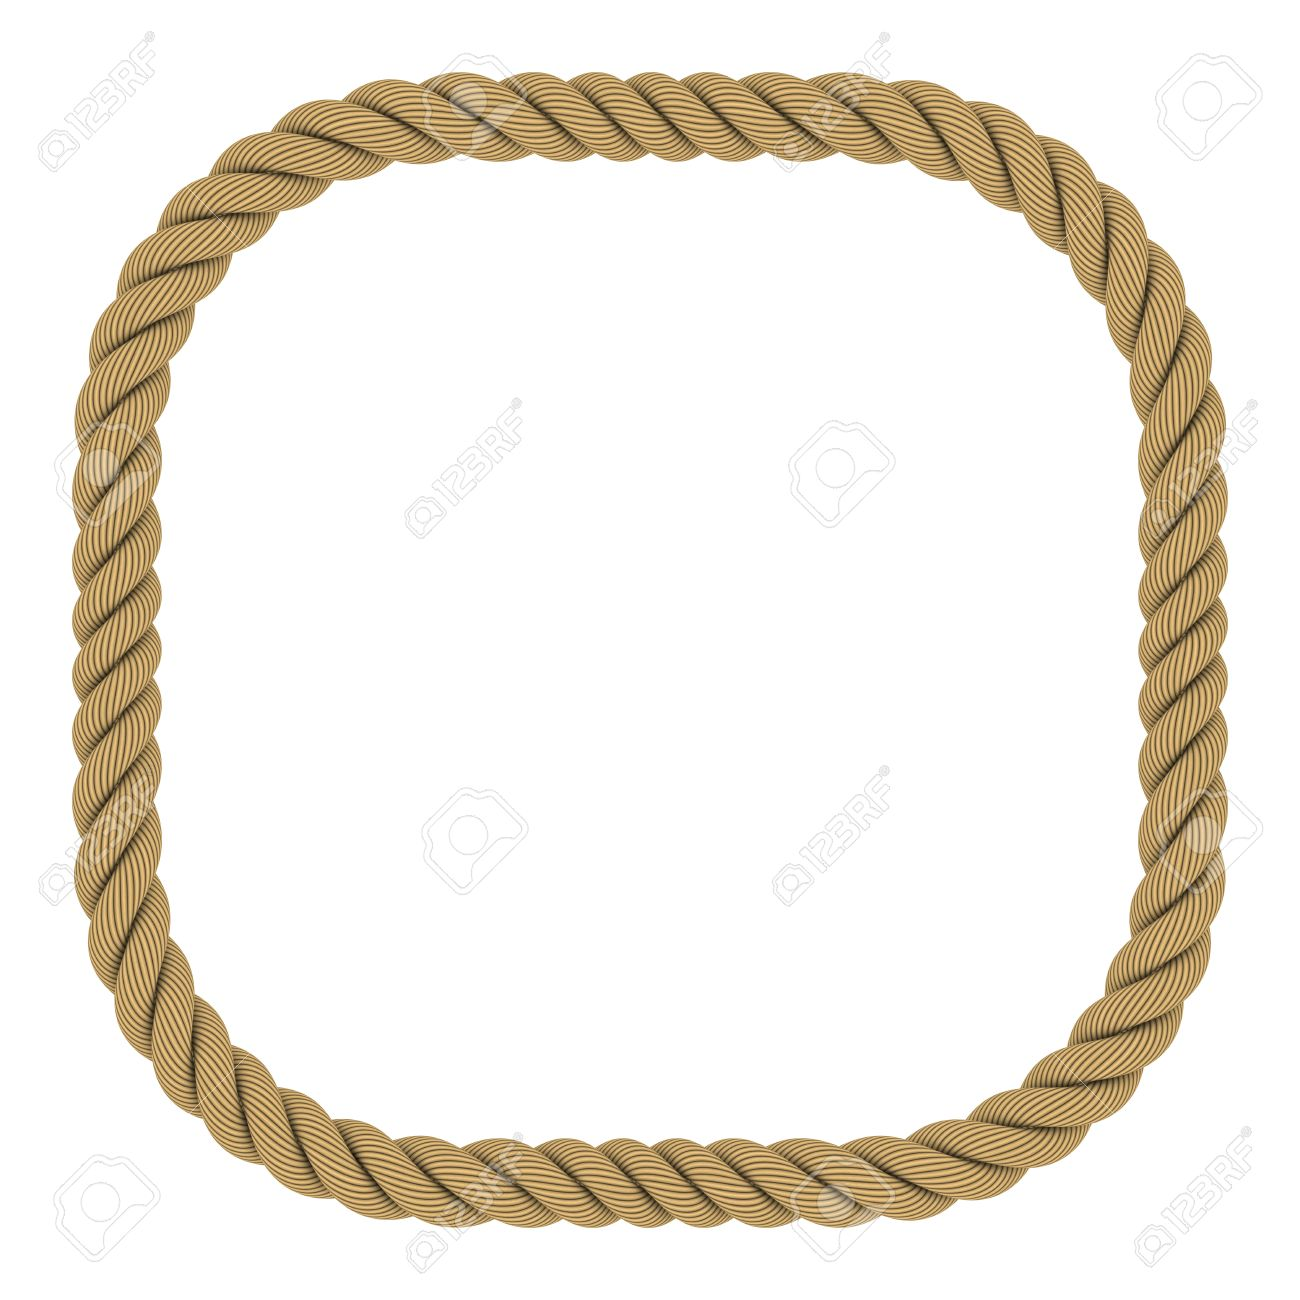 rounded square rope frame isolated on white background stock photo 51619361